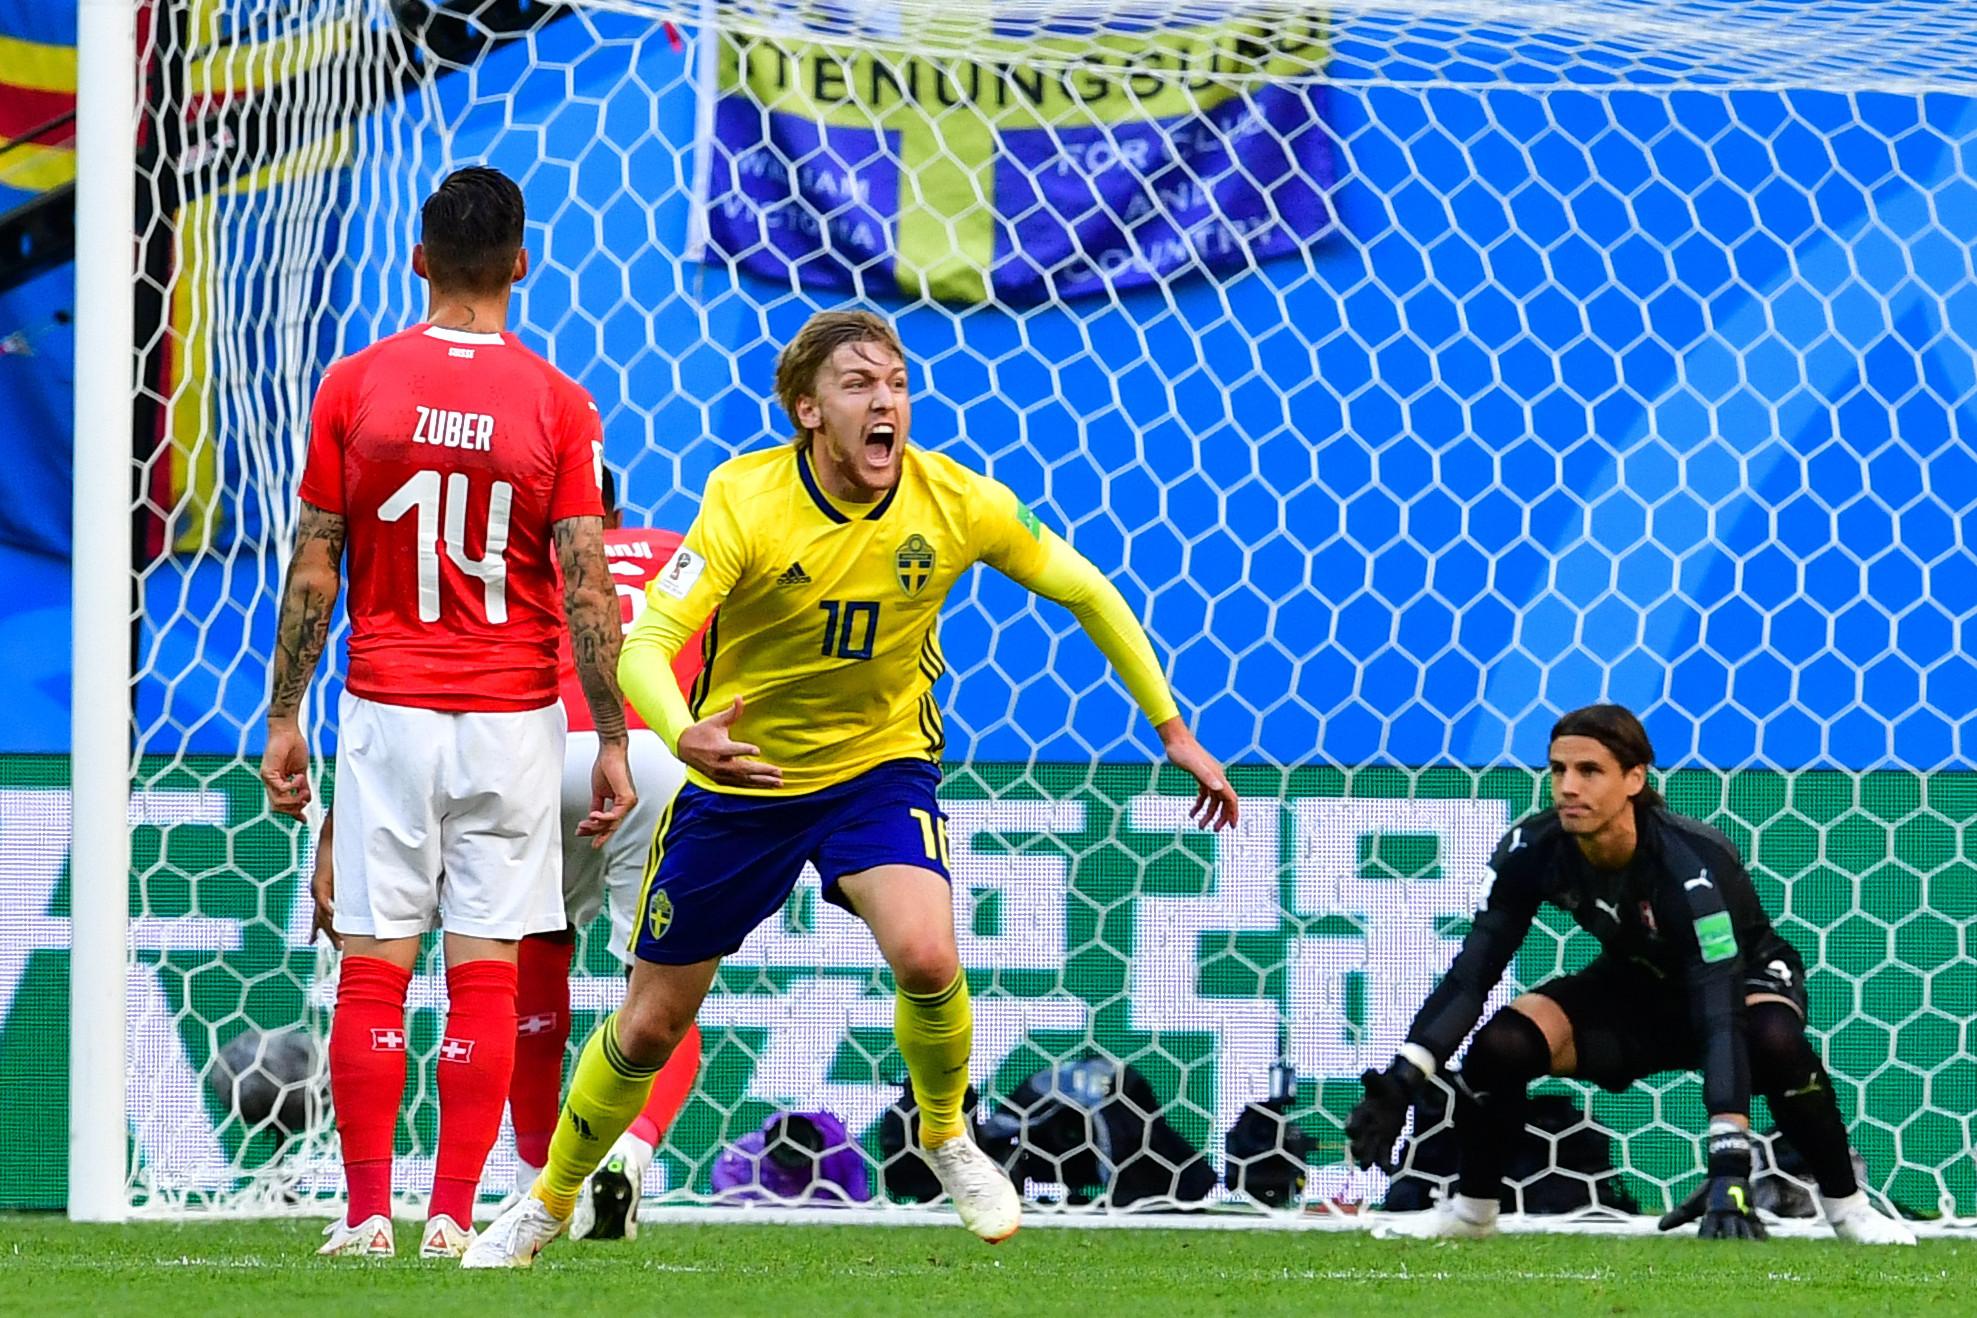 Emil Forsberg's deflected effort handed Sweden victory over Switzerland ©Getty Images